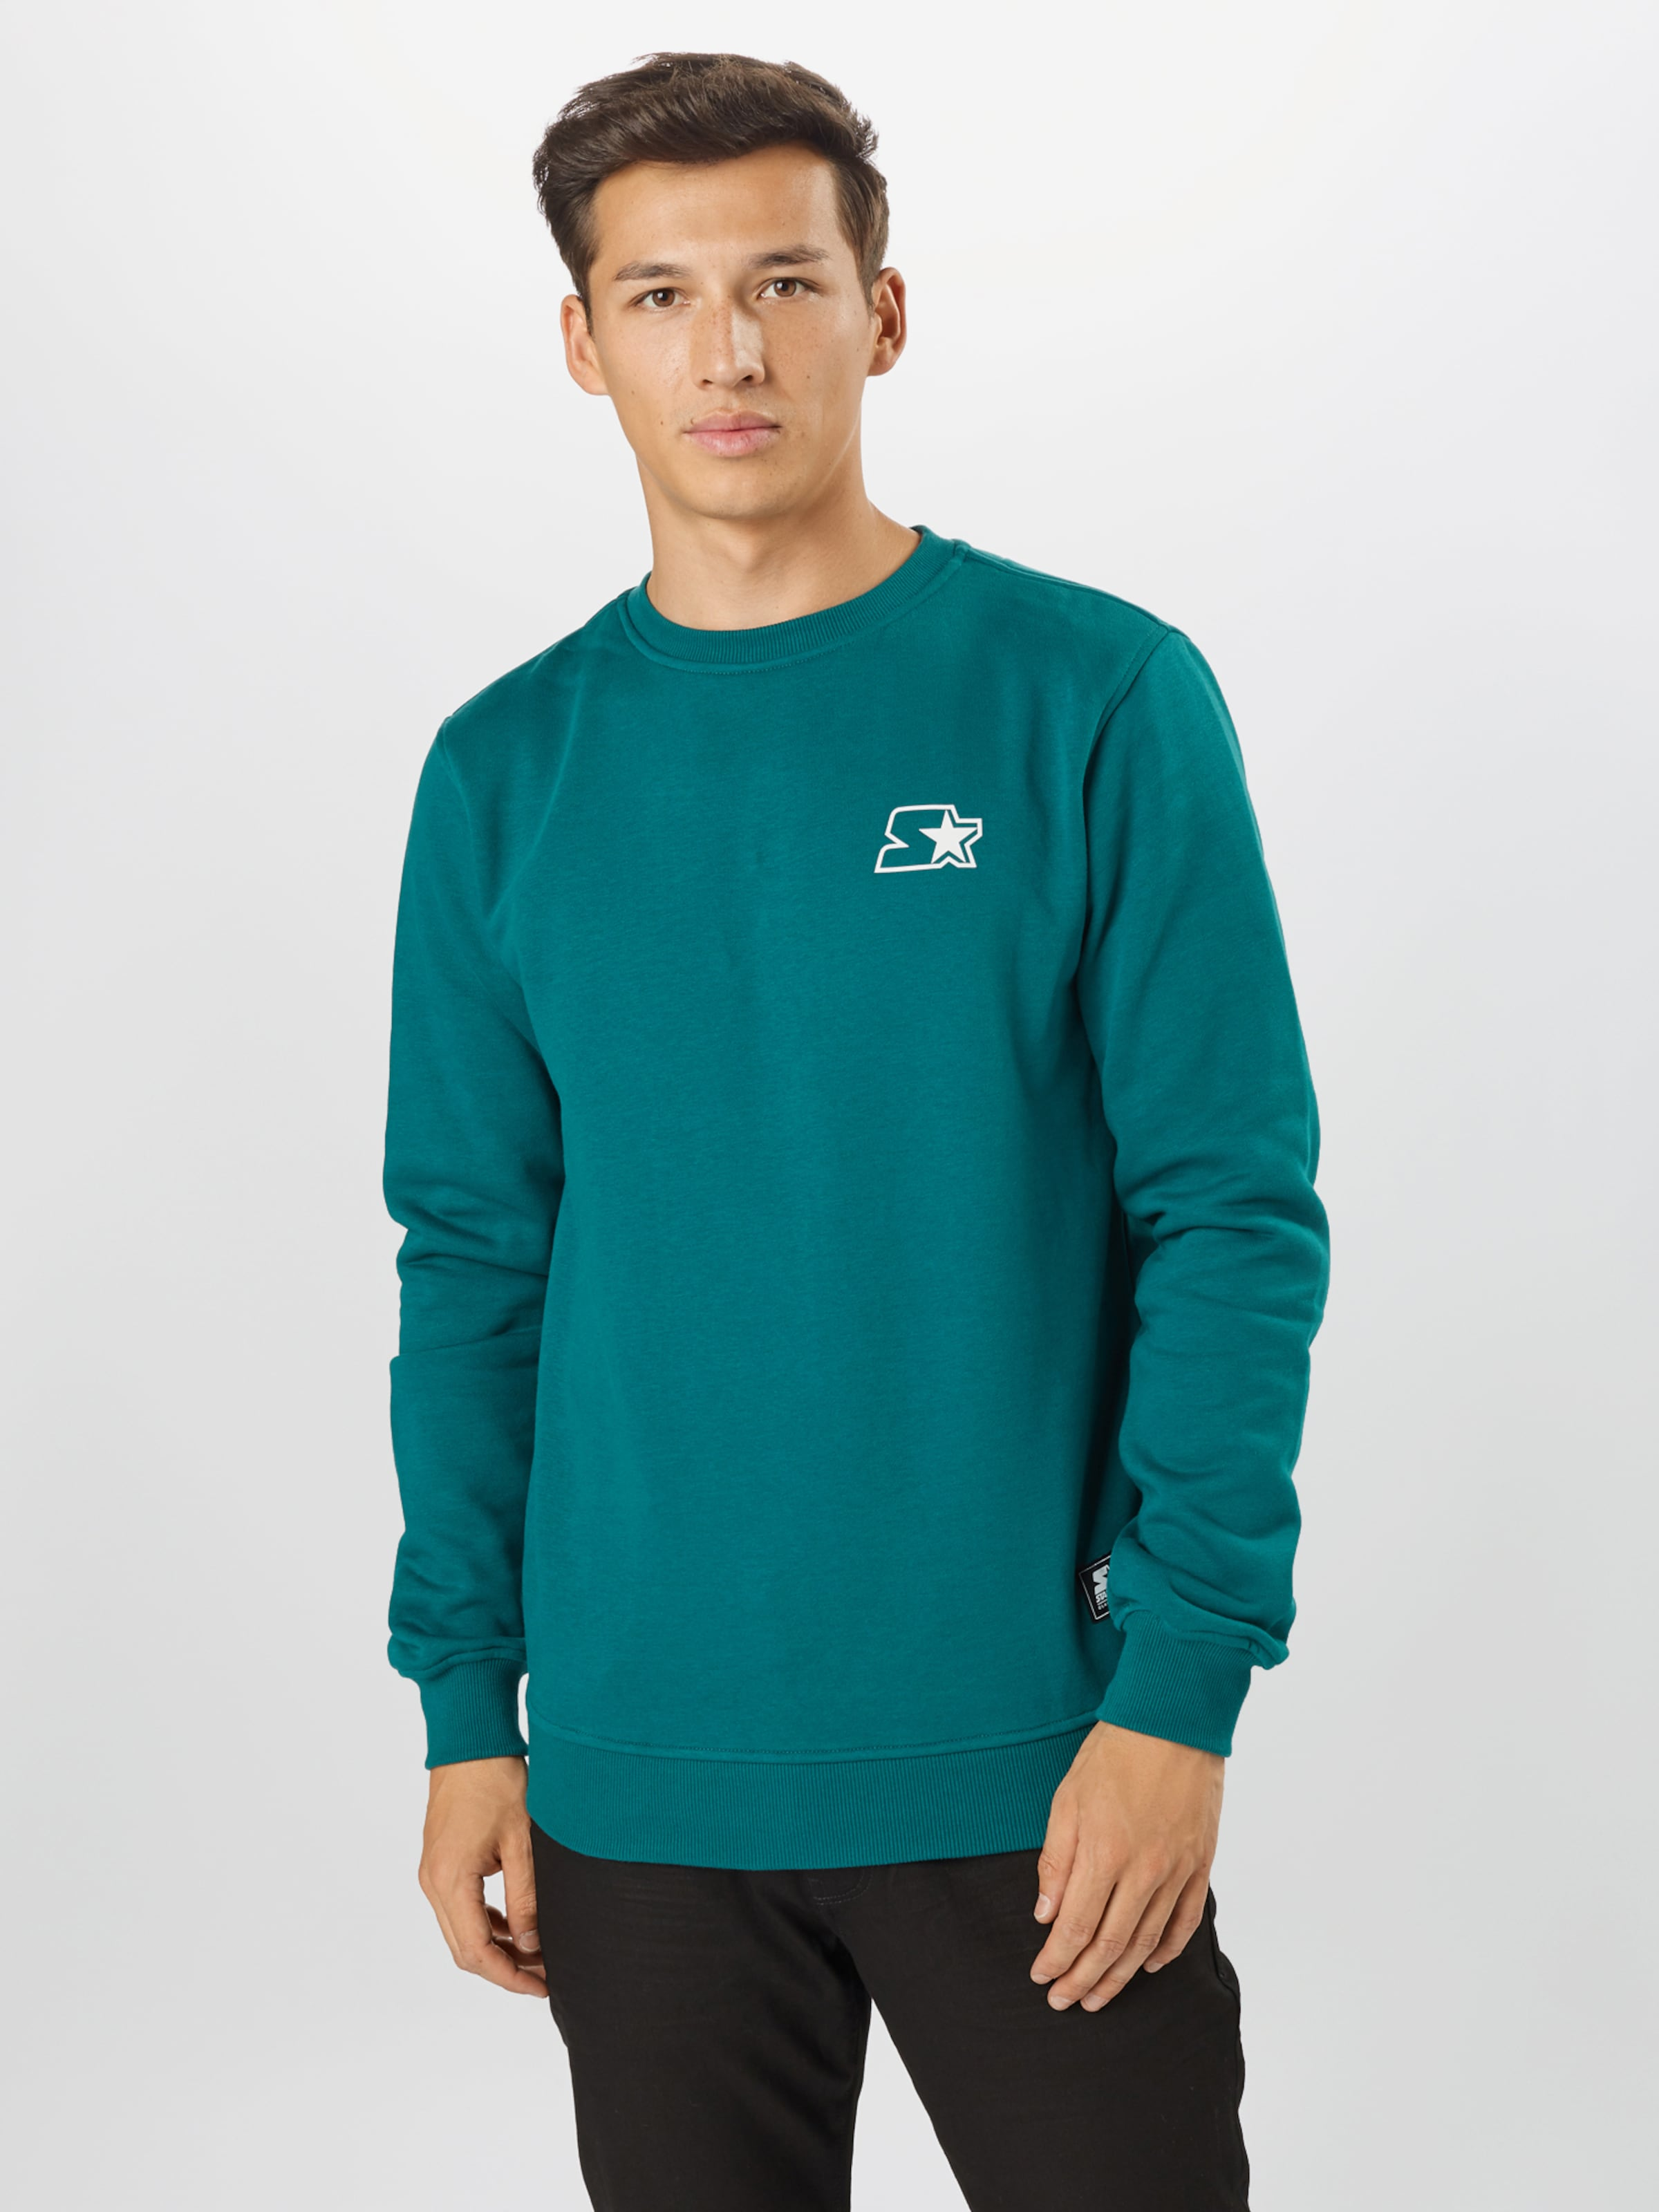 Starter Black Label Sweatshirt in petrol / weiß Unifarben SBL0025003000001